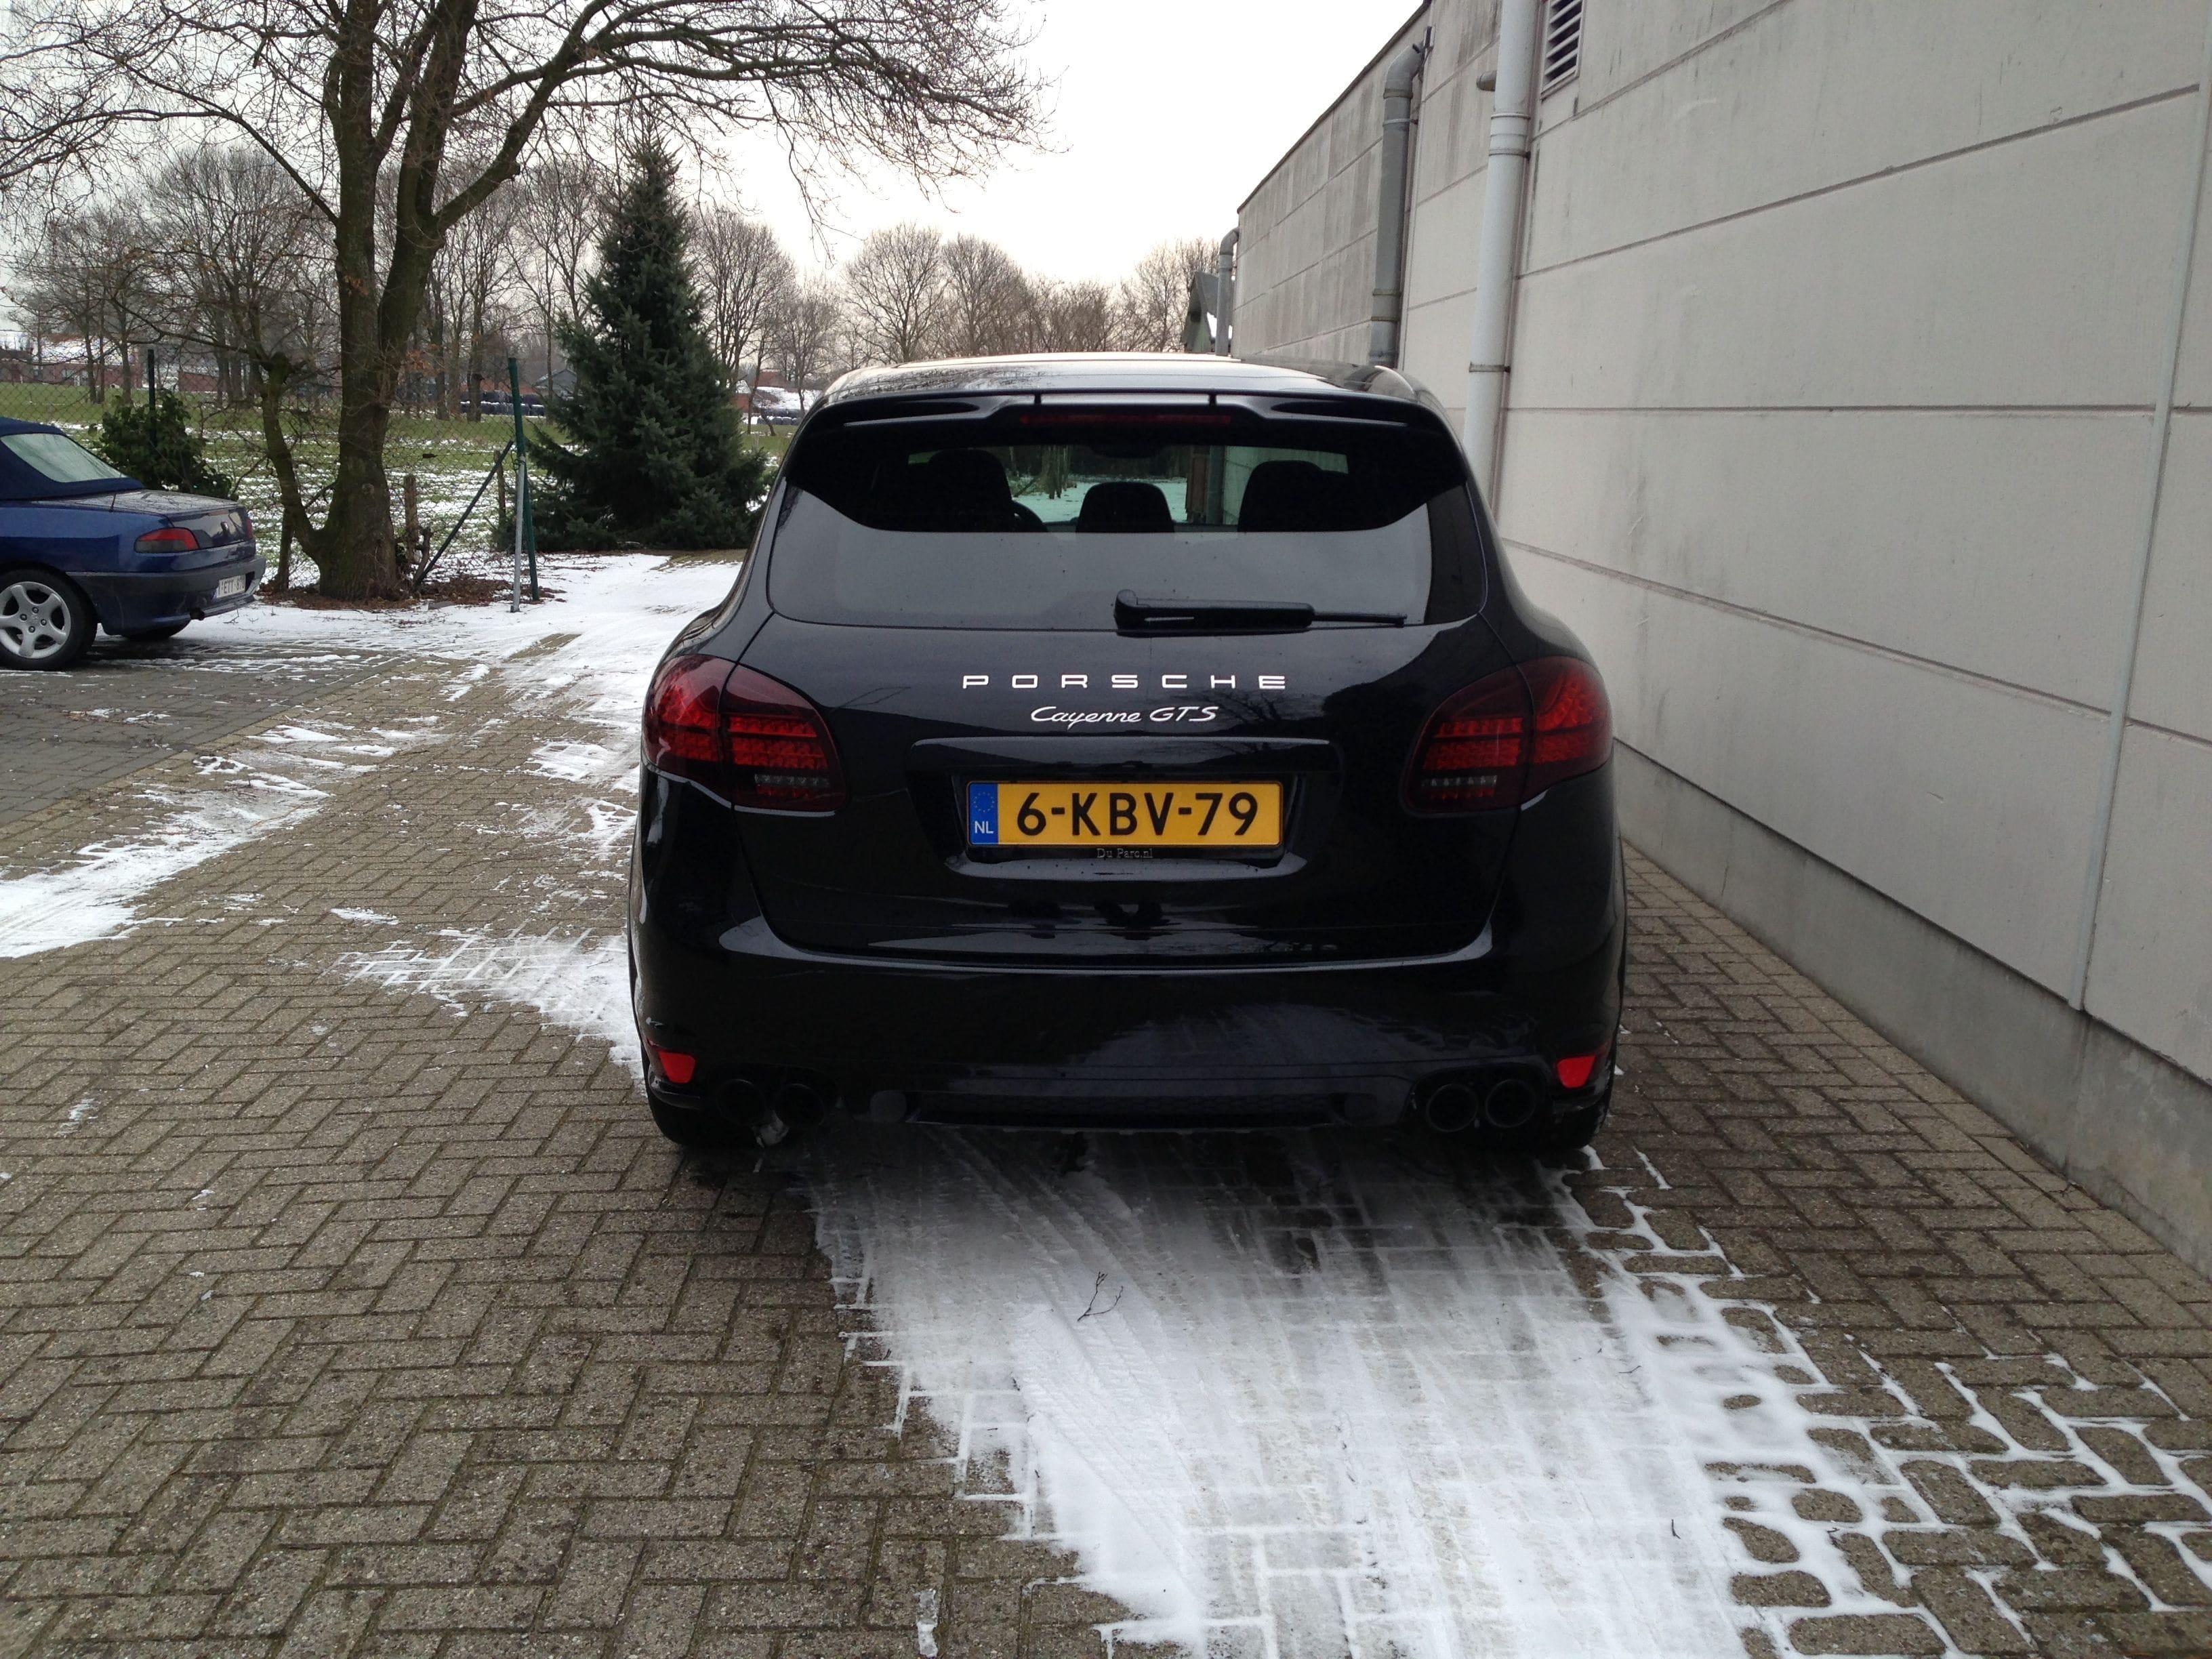 Porsche Cayenne GTS met Gunpowder Wrap, Carwrapping door Wrapmyride.nu Foto-nr:6757, ©2020